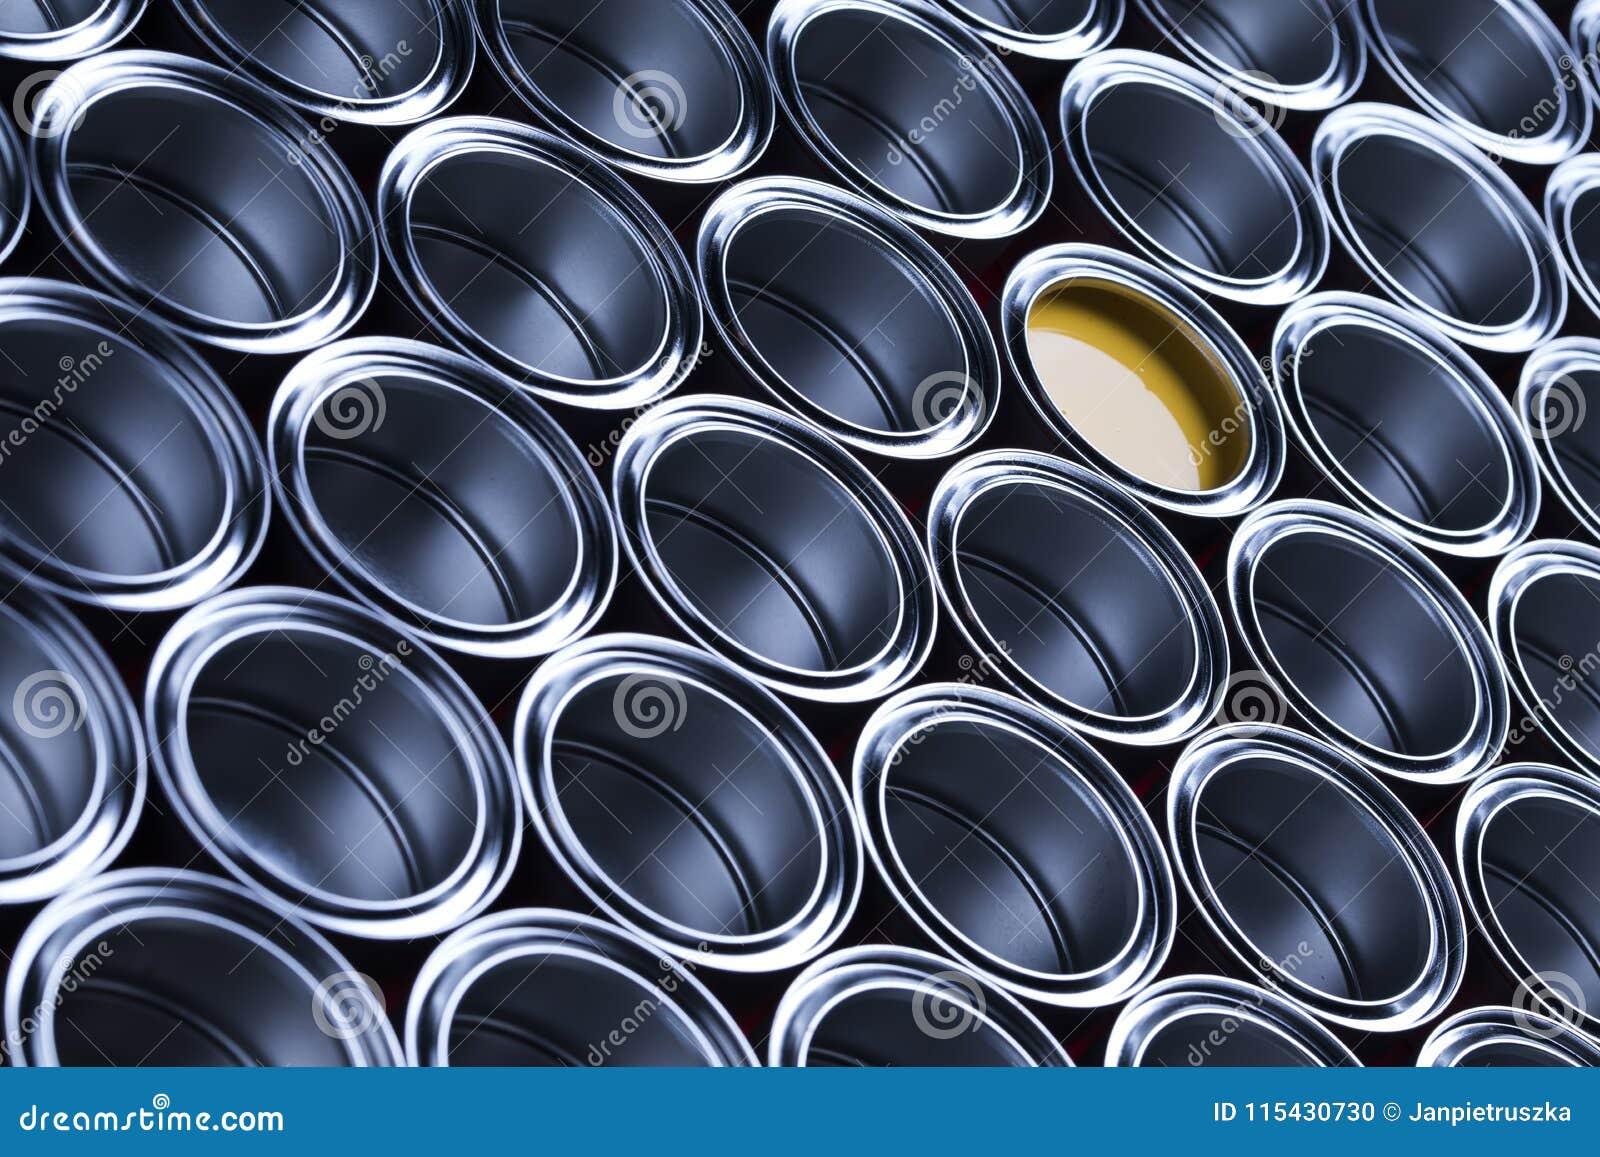 Metal tin paint cans